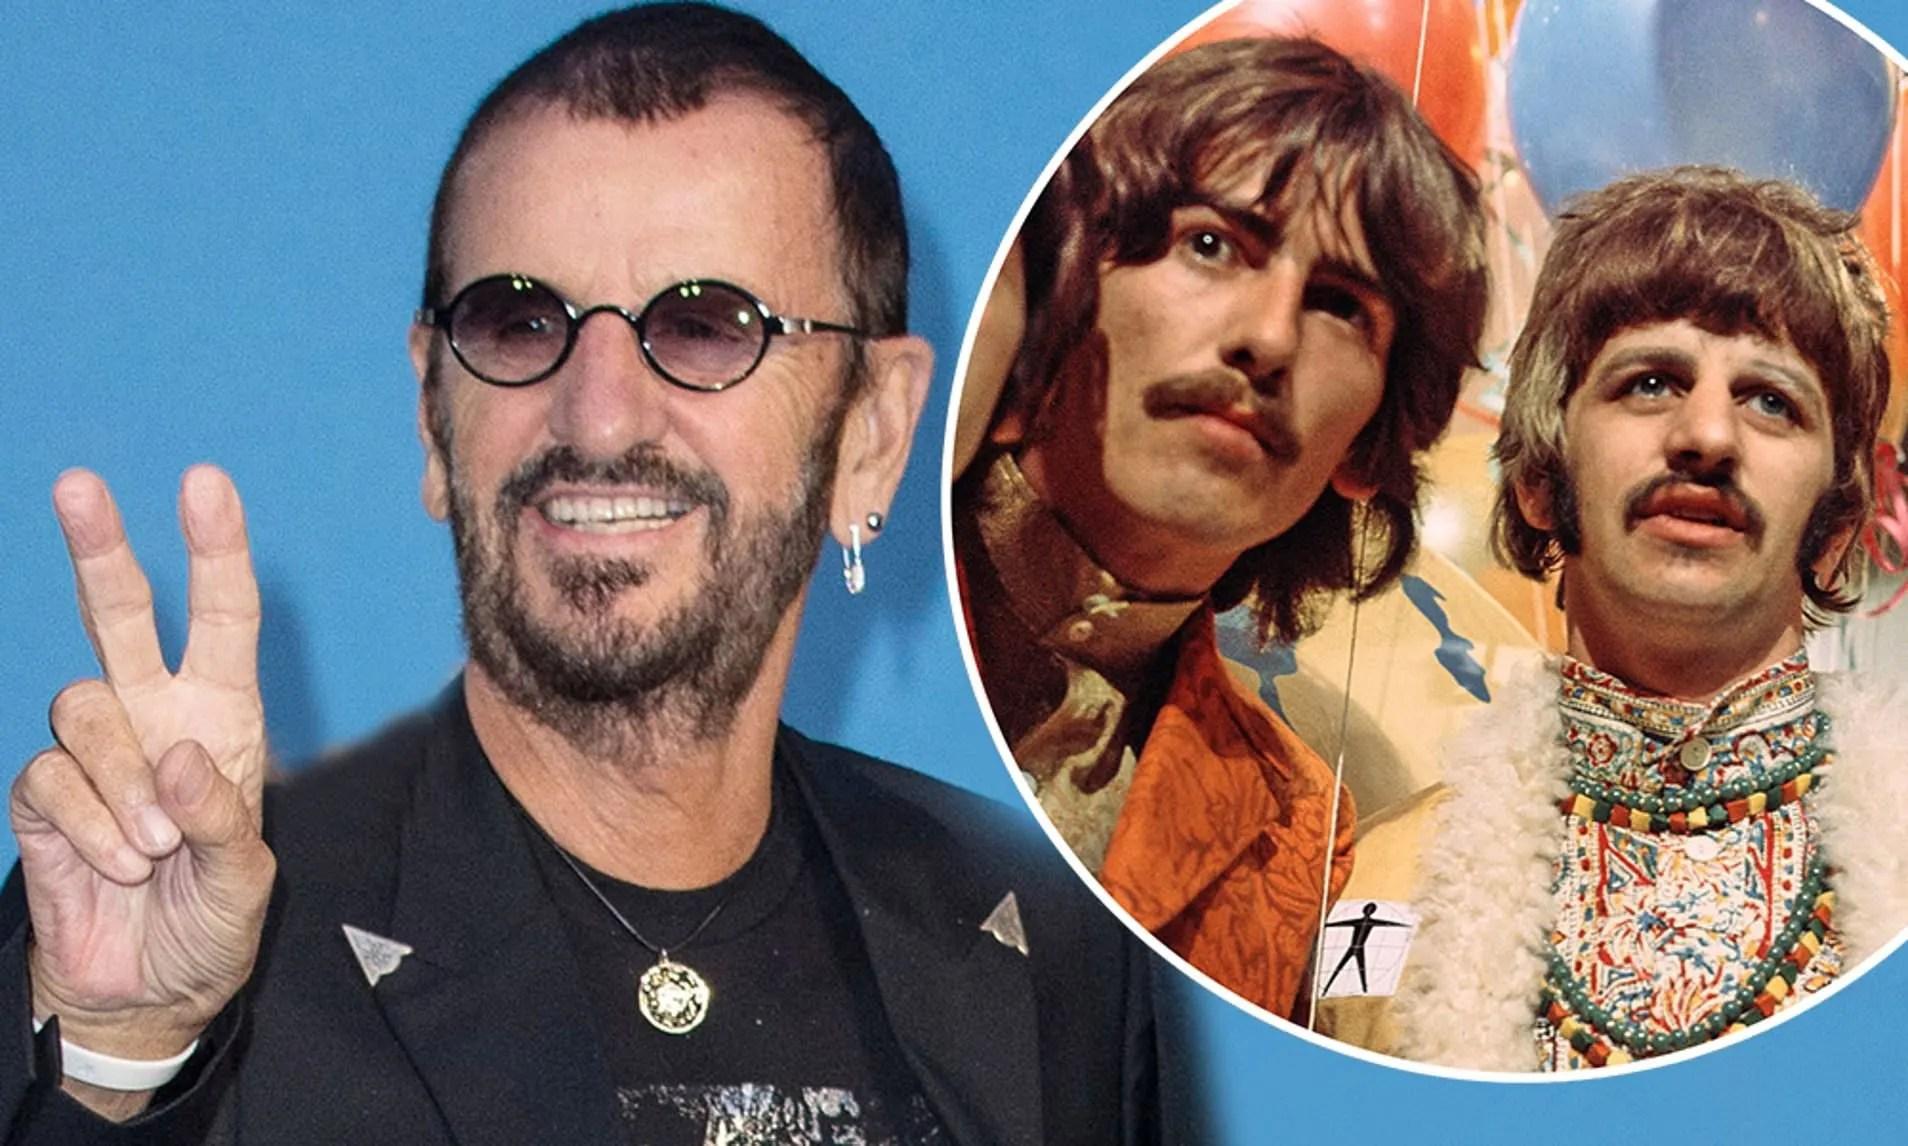 ¿Sabes lo que a Ringo no le gustaba de The Beatles?